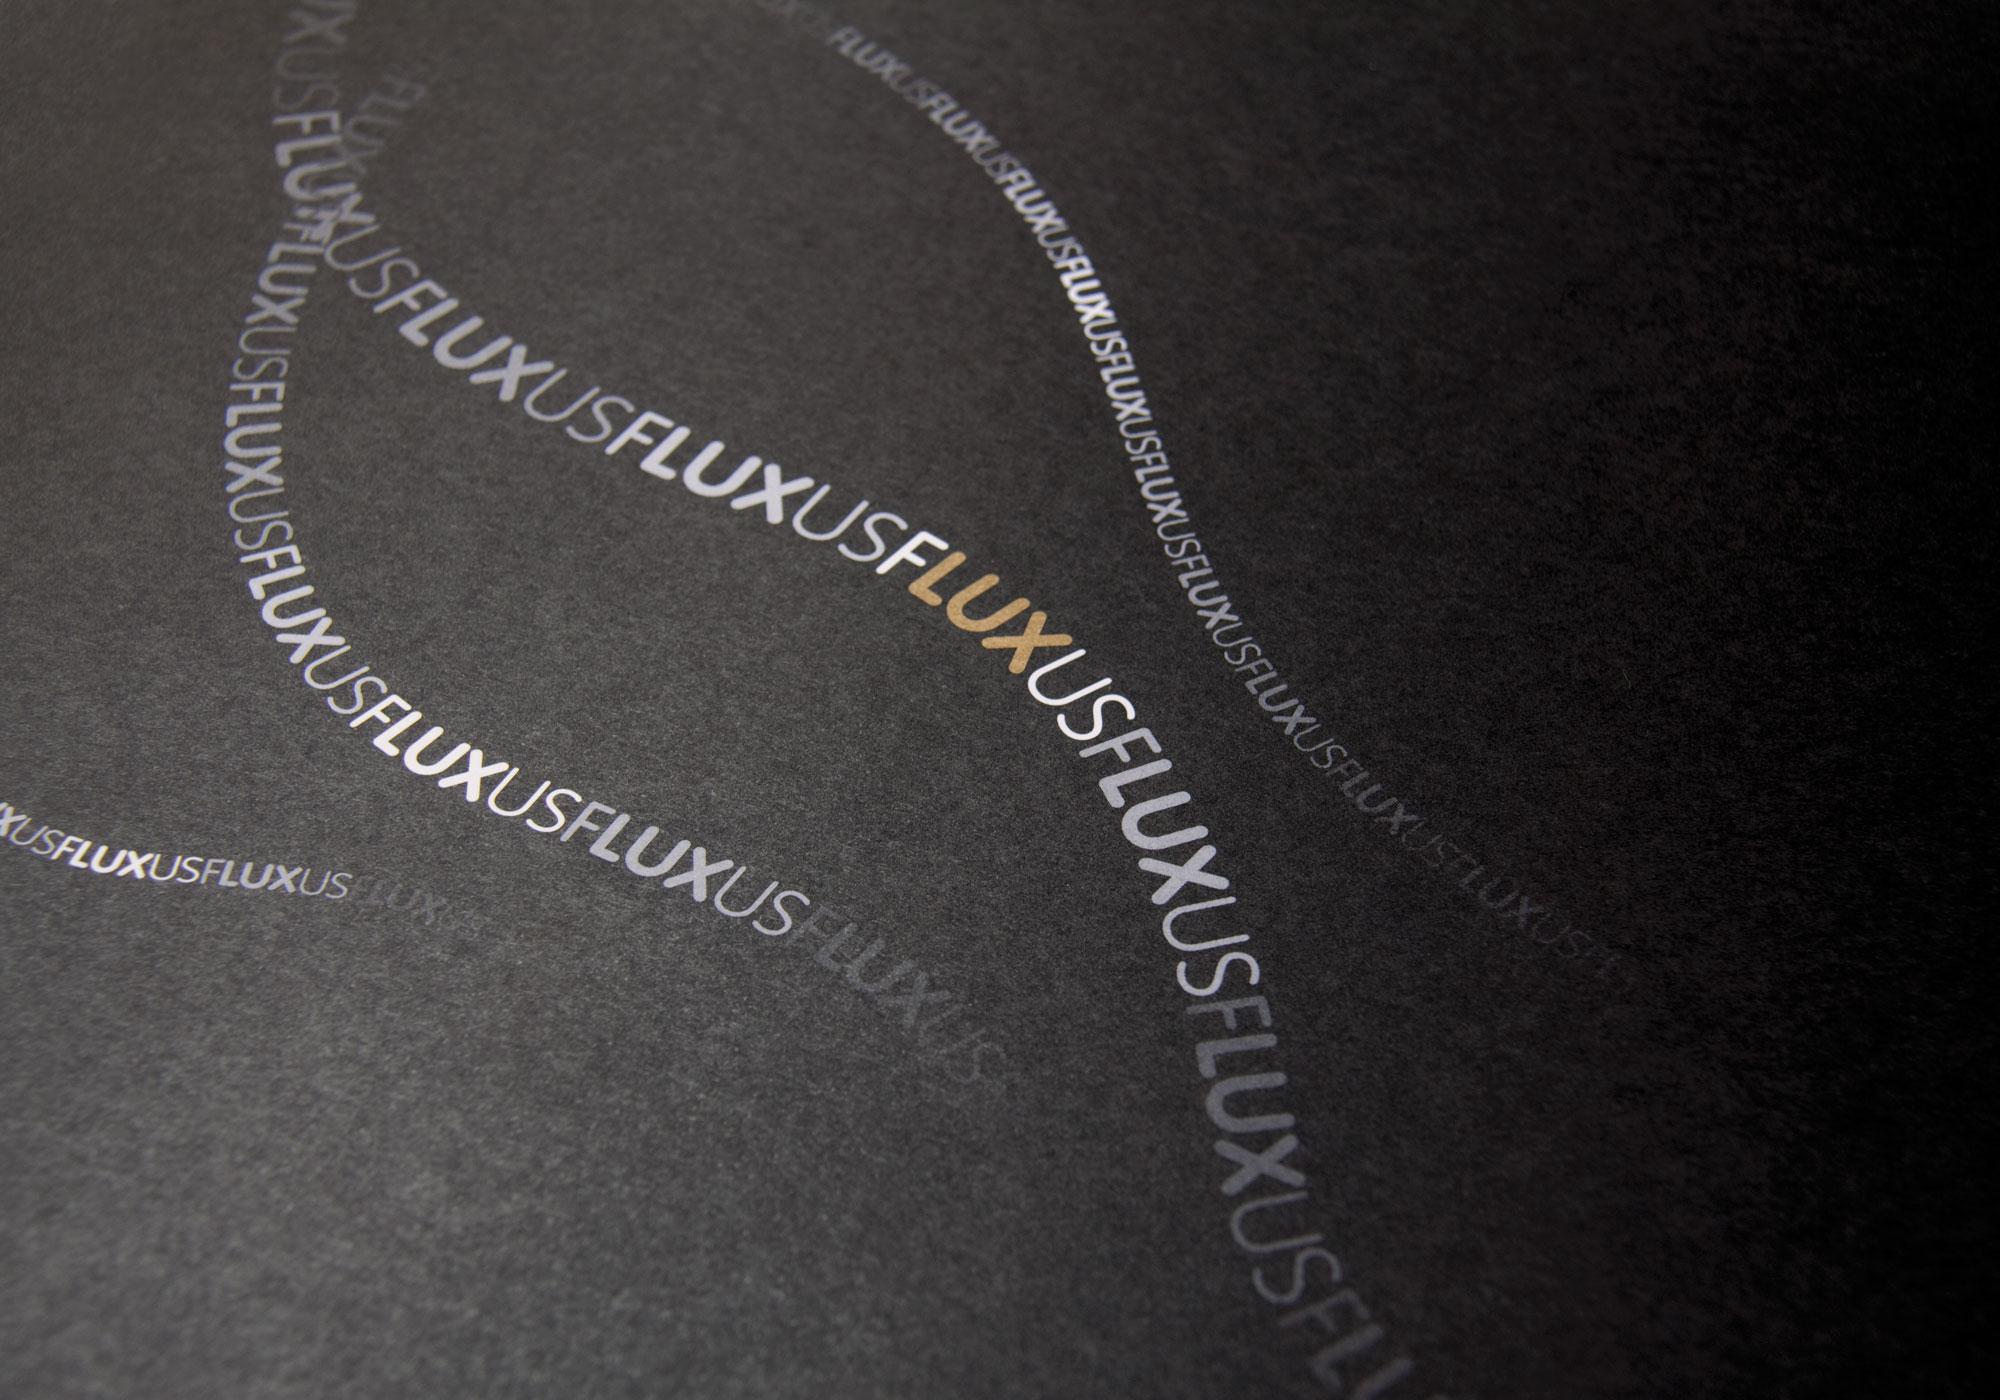 fluxus-stationary-detail-1